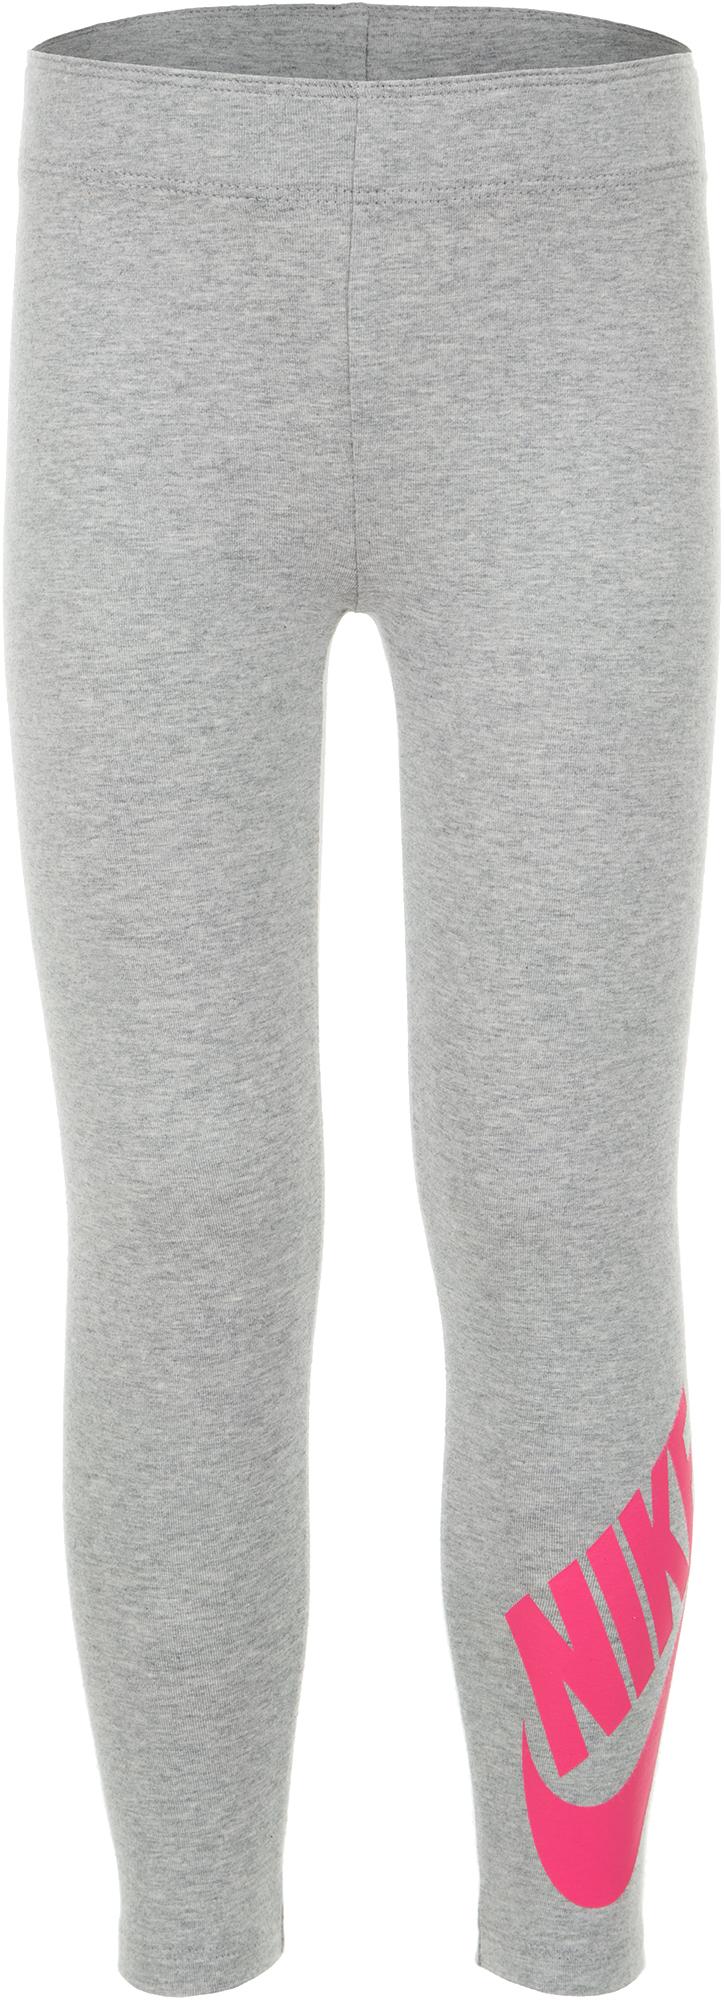 Nike Легинсы для девочек Nike, размер 116